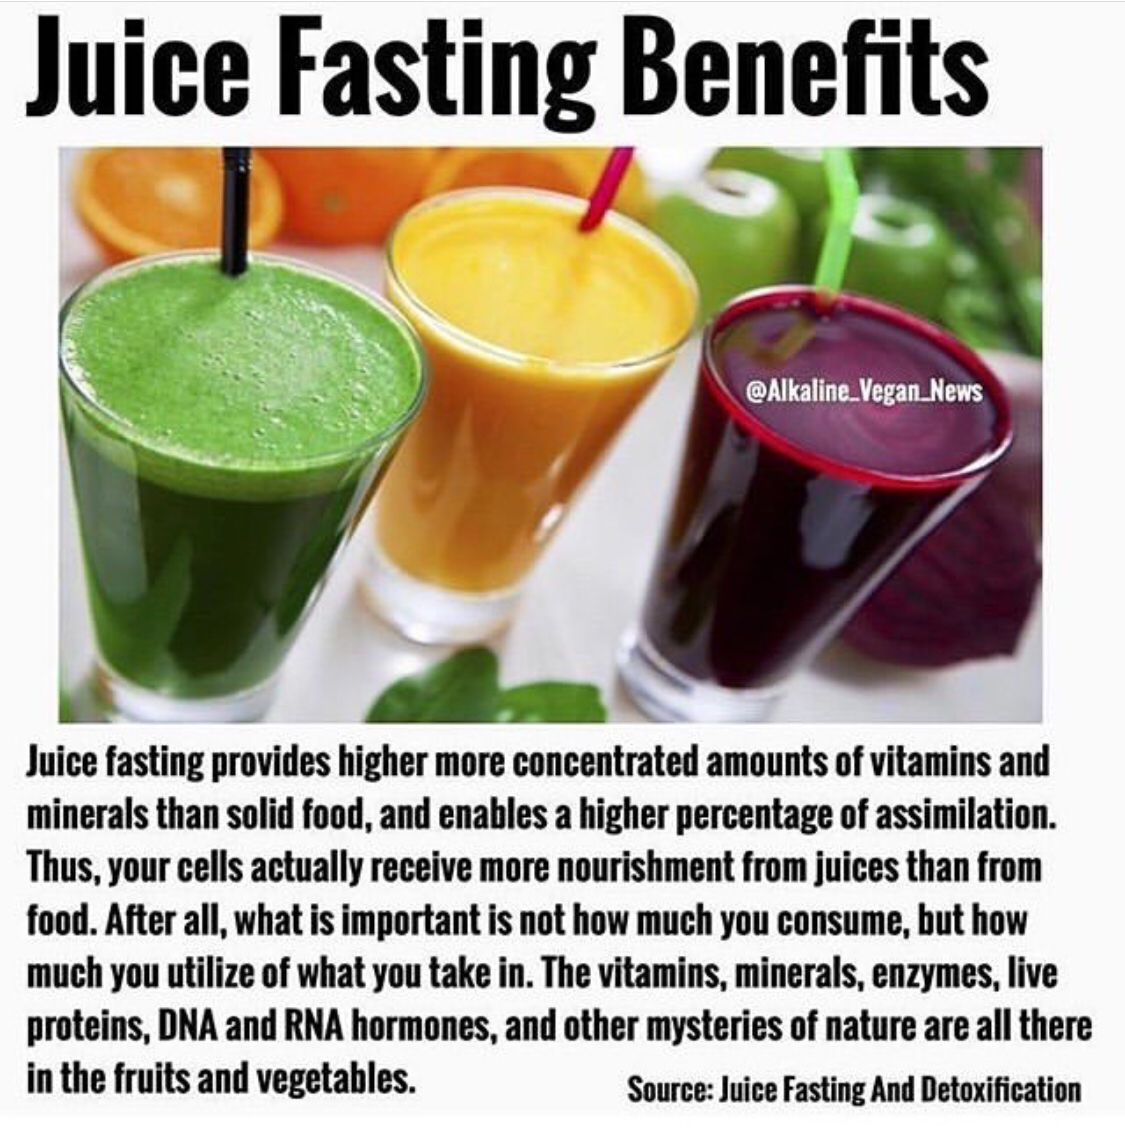 juice fasting benefits | juice fast, juicing recipes, food